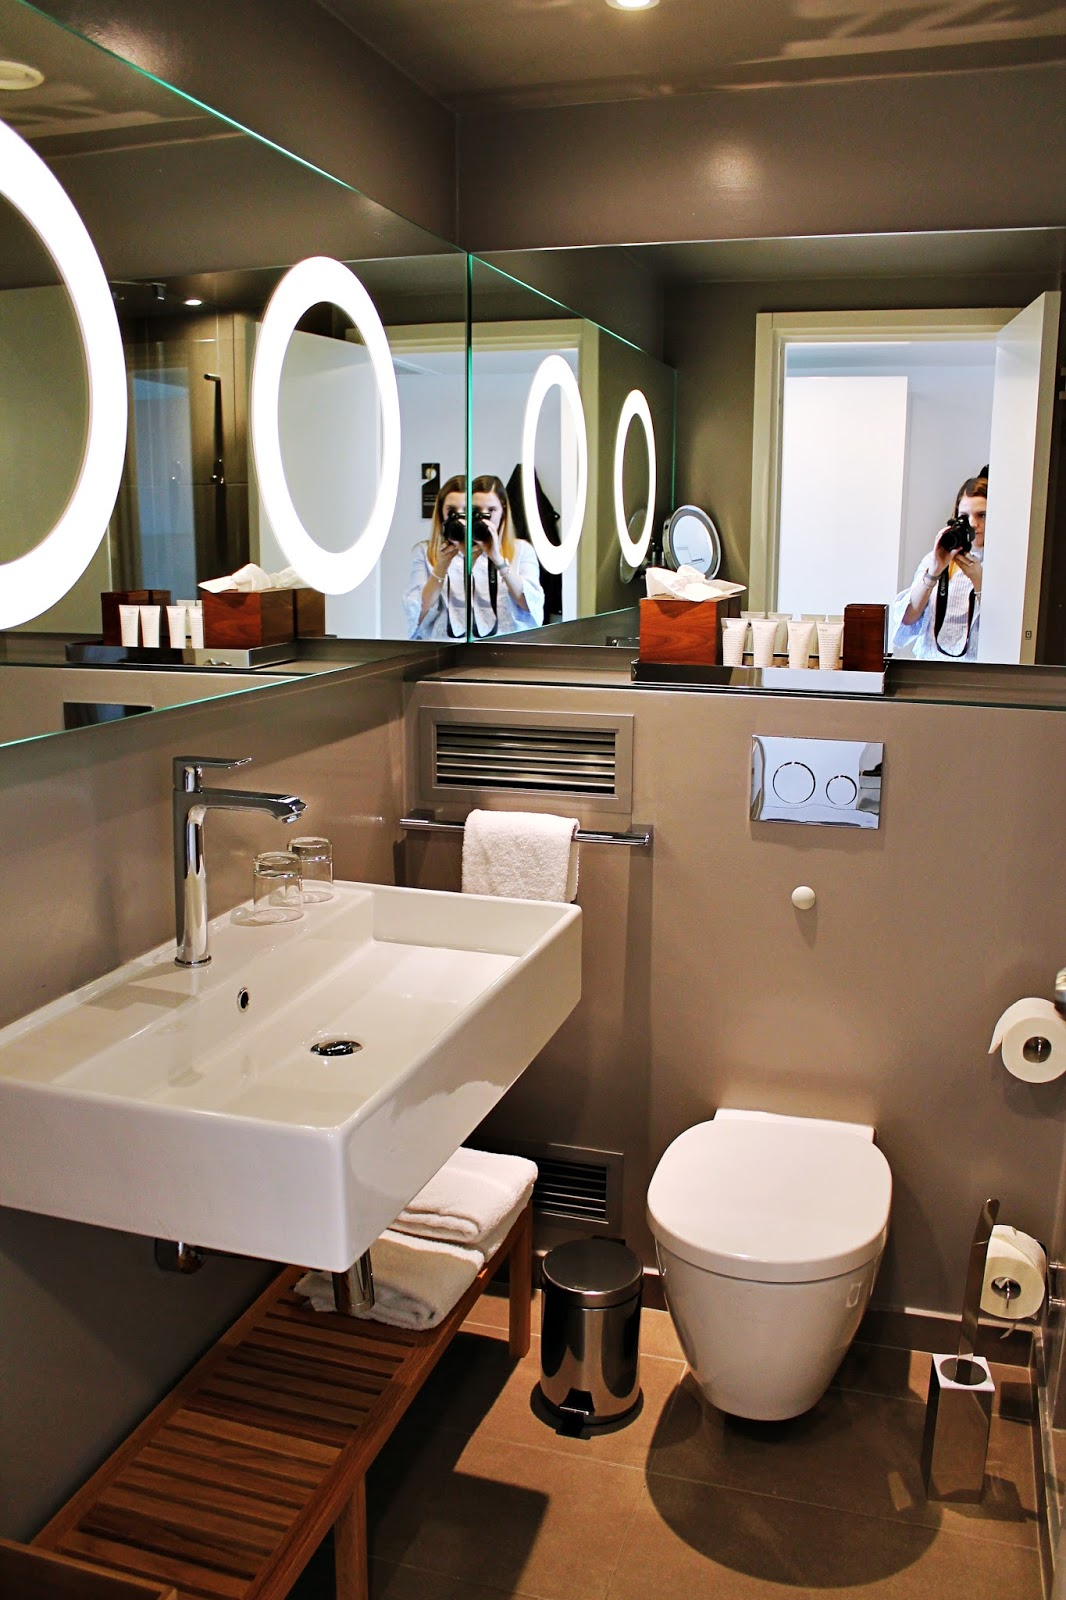 hotel review wyndham grand frankfurt becciqueen. Black Bedroom Furniture Sets. Home Design Ideas